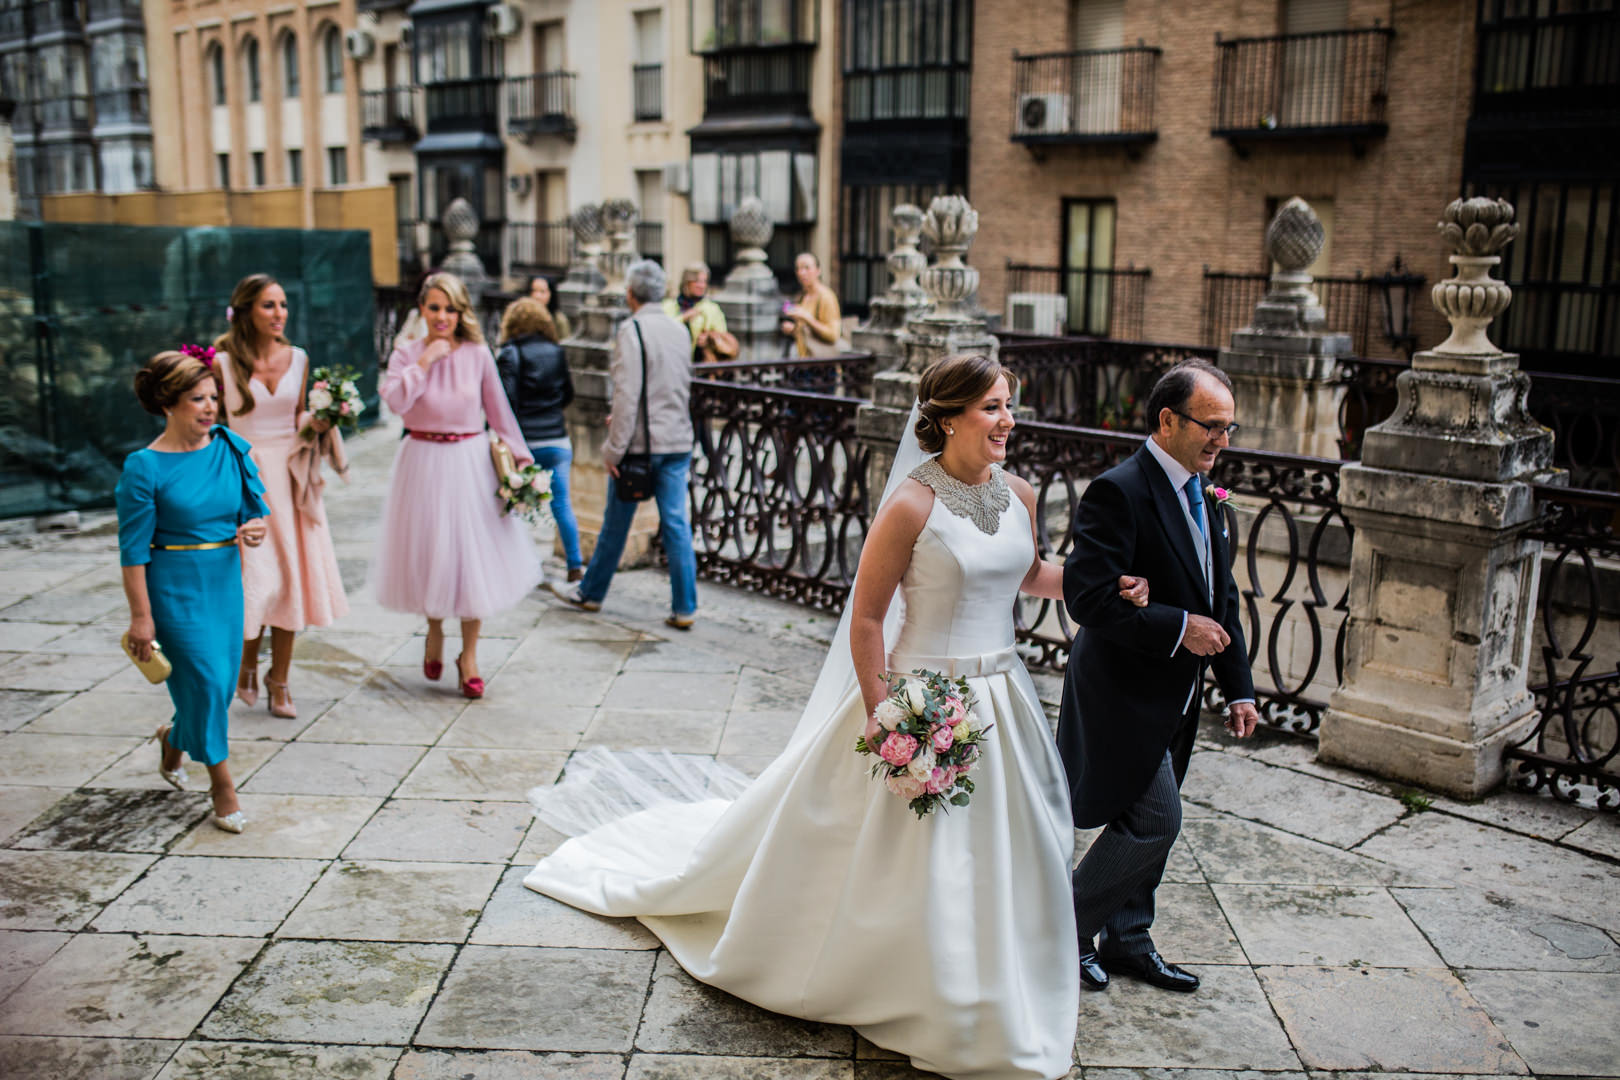 Boda-Catedral-Jaen-Hamburgo-Maria-David-engagement-Rafael-Torres-fotografo-bodas-sevilla-madrid-barcelona-wedding-photographer--19.jpg